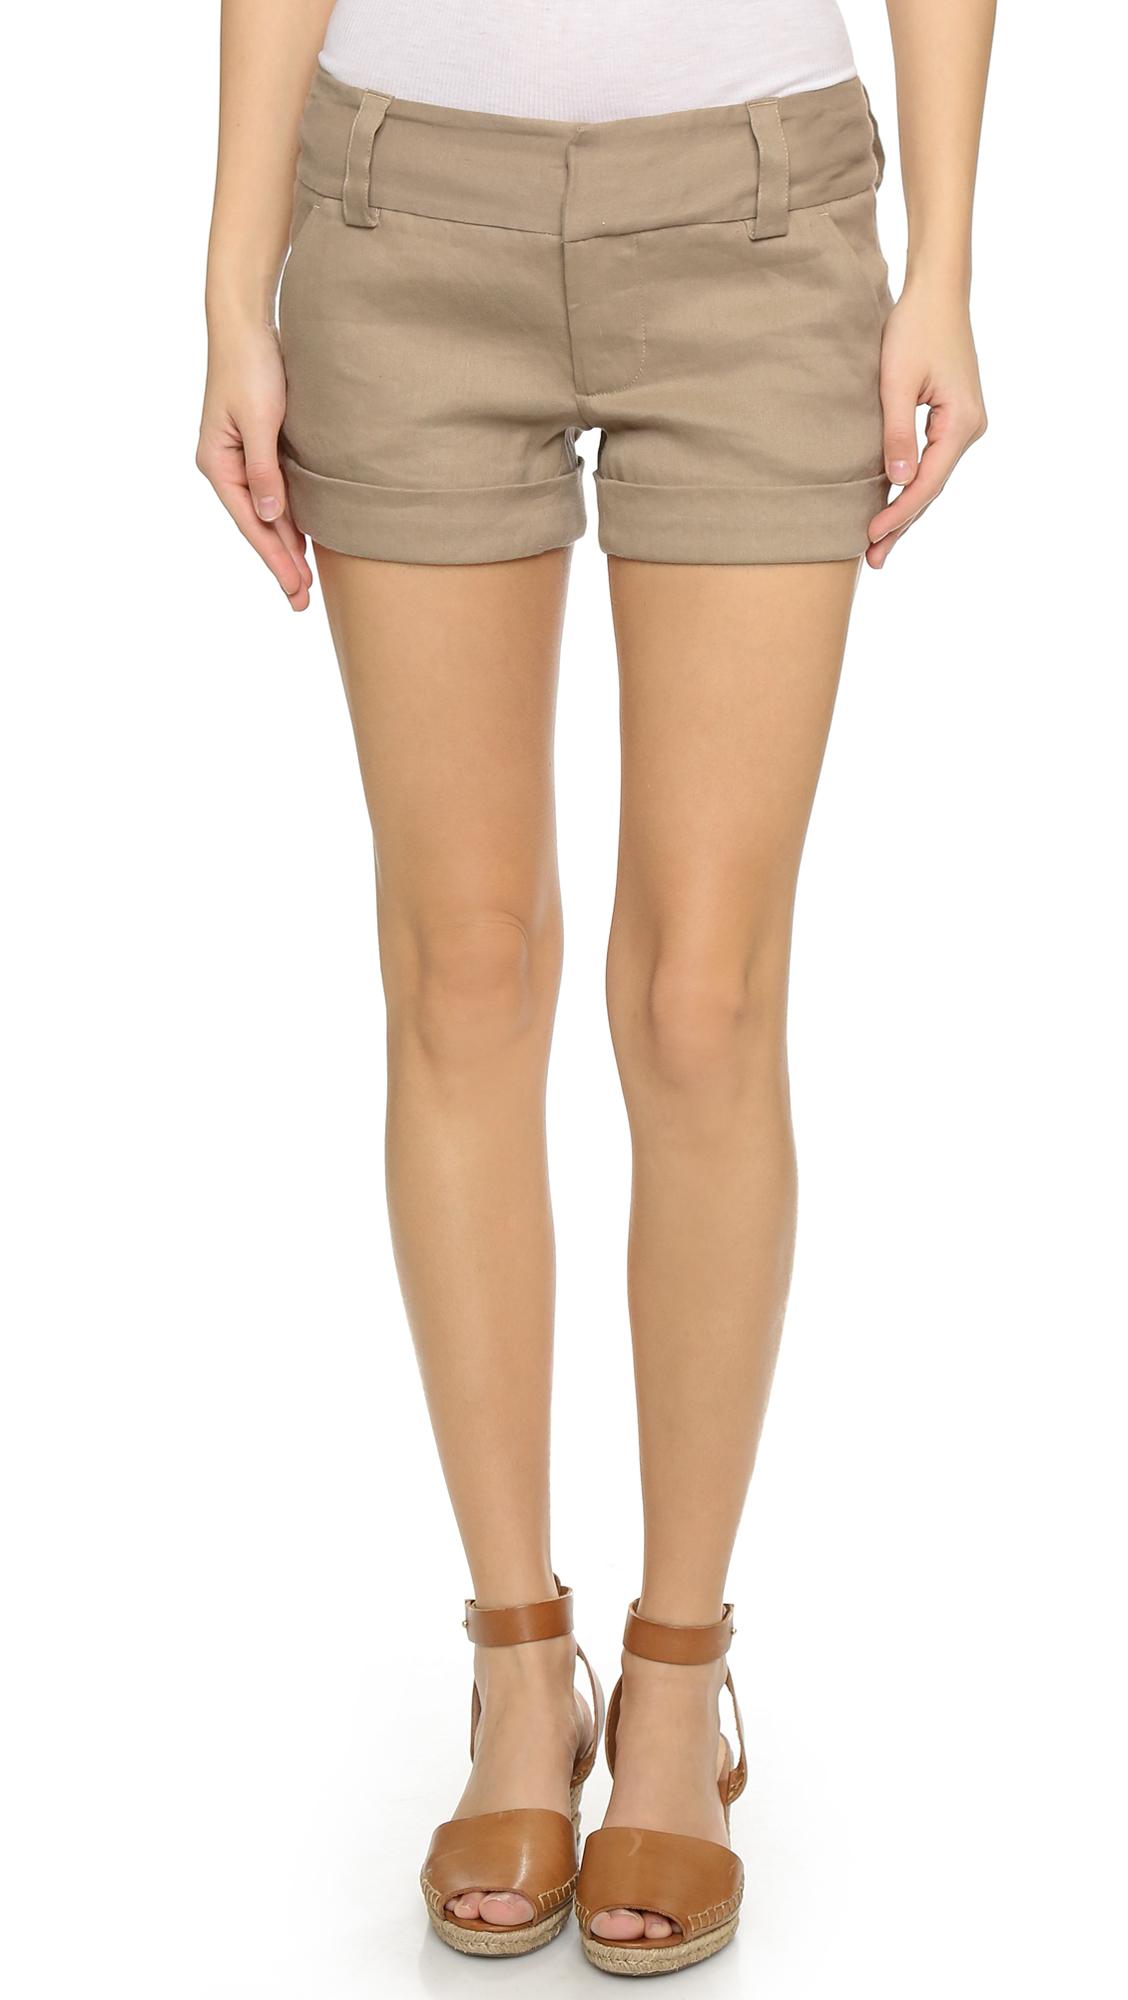 Alice + Olivia Cady Cuff Shorts - Khaki at Shopbop